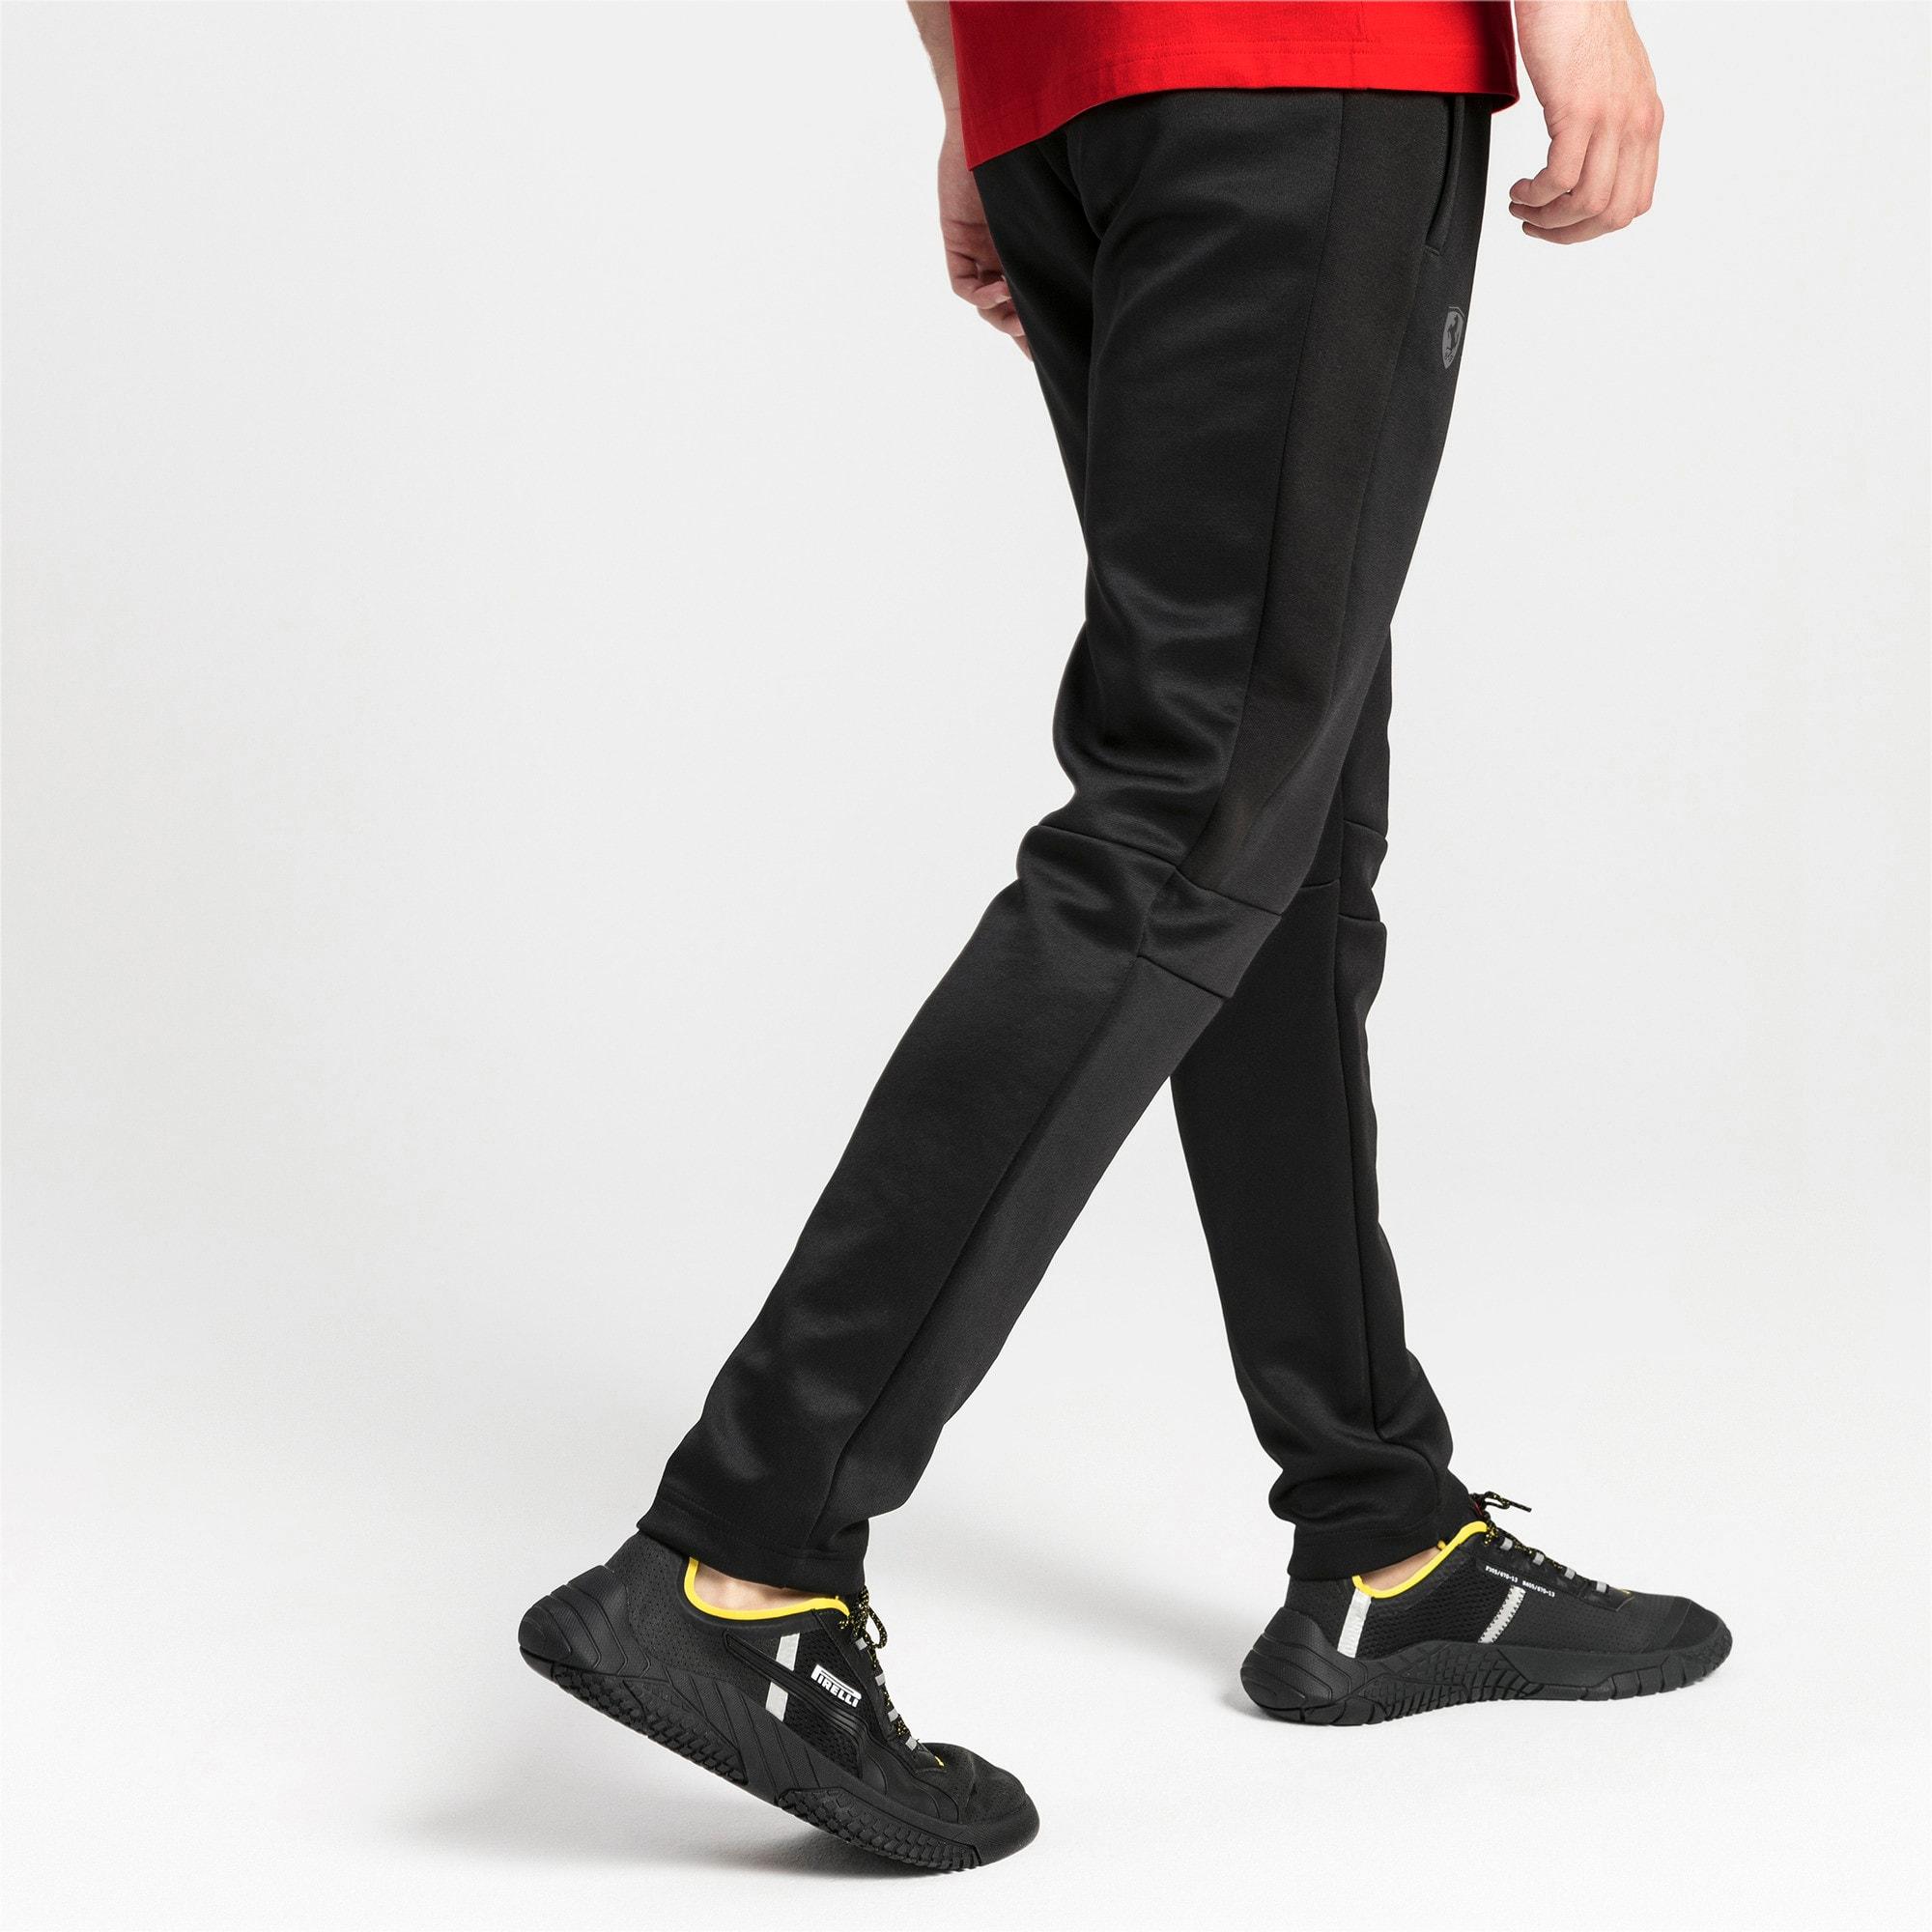 Thumbnail 2 of Ferrari T7 Men's Track Pants, Puma Black, medium